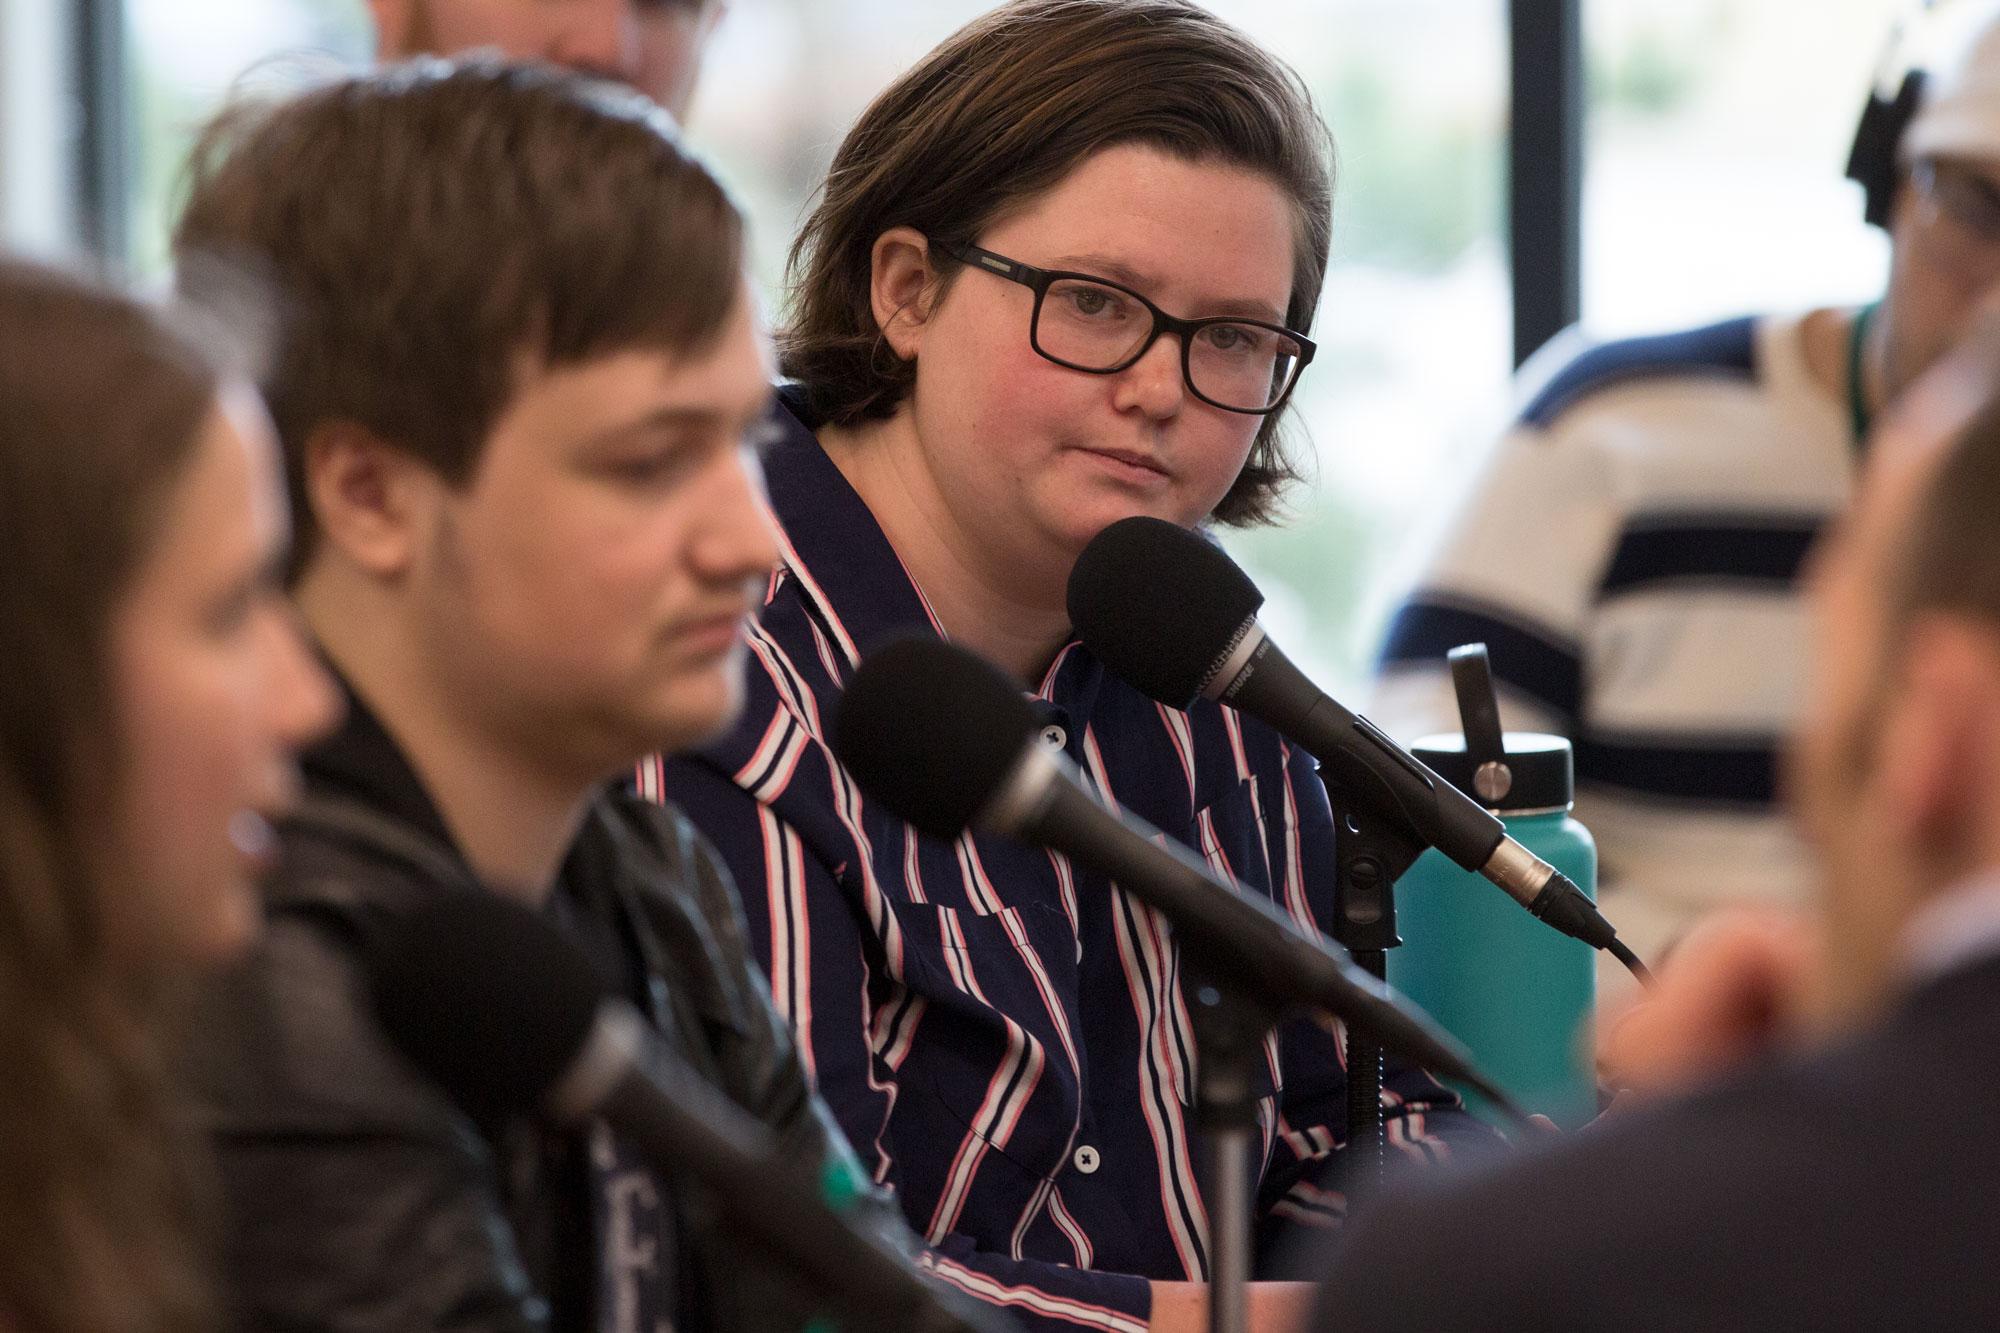 Photo: STEM Shooting Student Panel Colorado Matters 6 HV